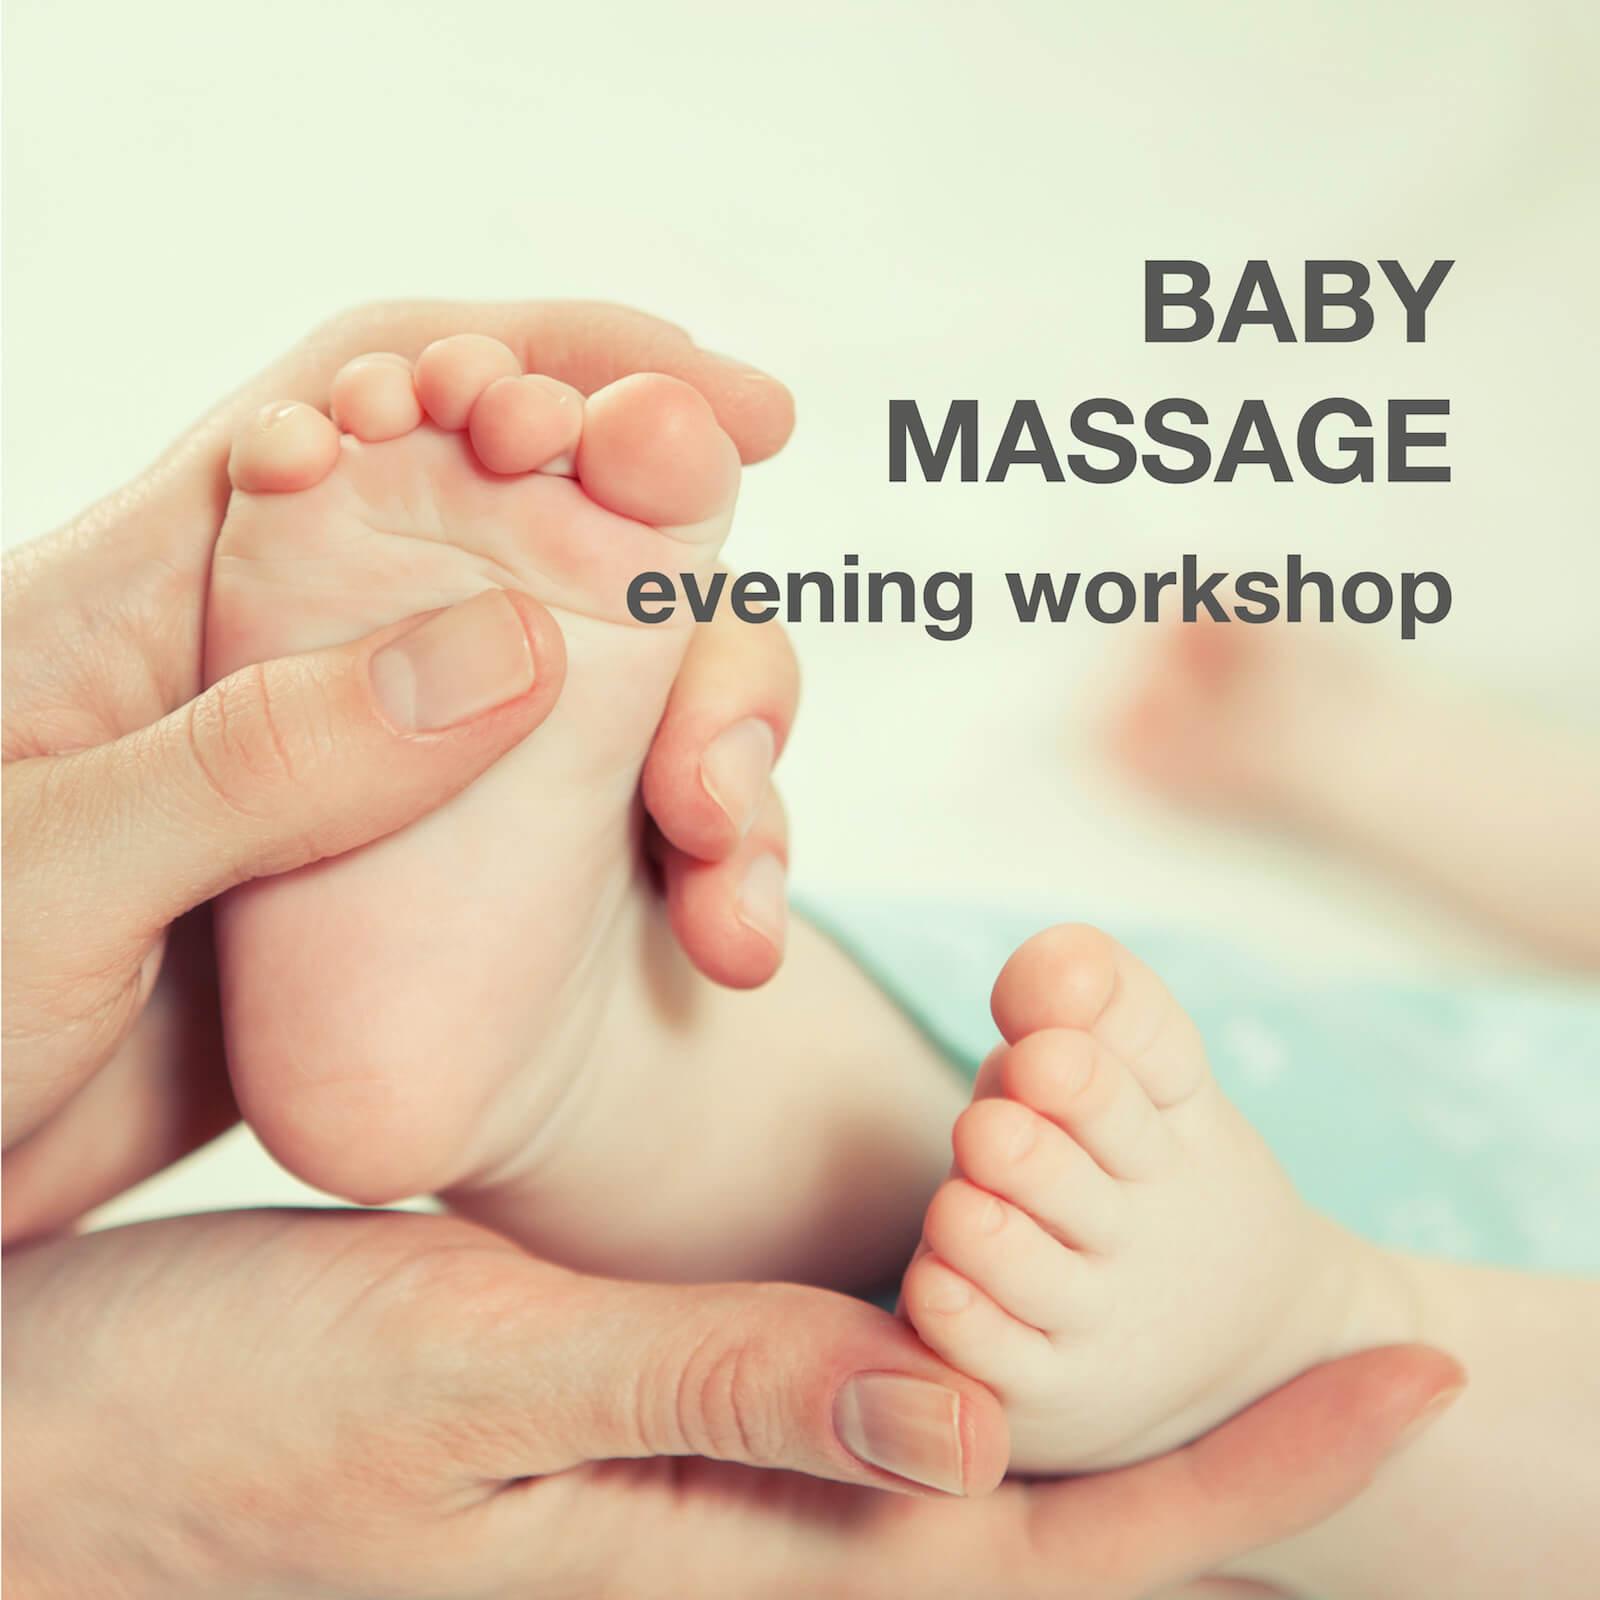 BABY MASSAGE –Evening seminar / workshop for nannies / matertniy nurses